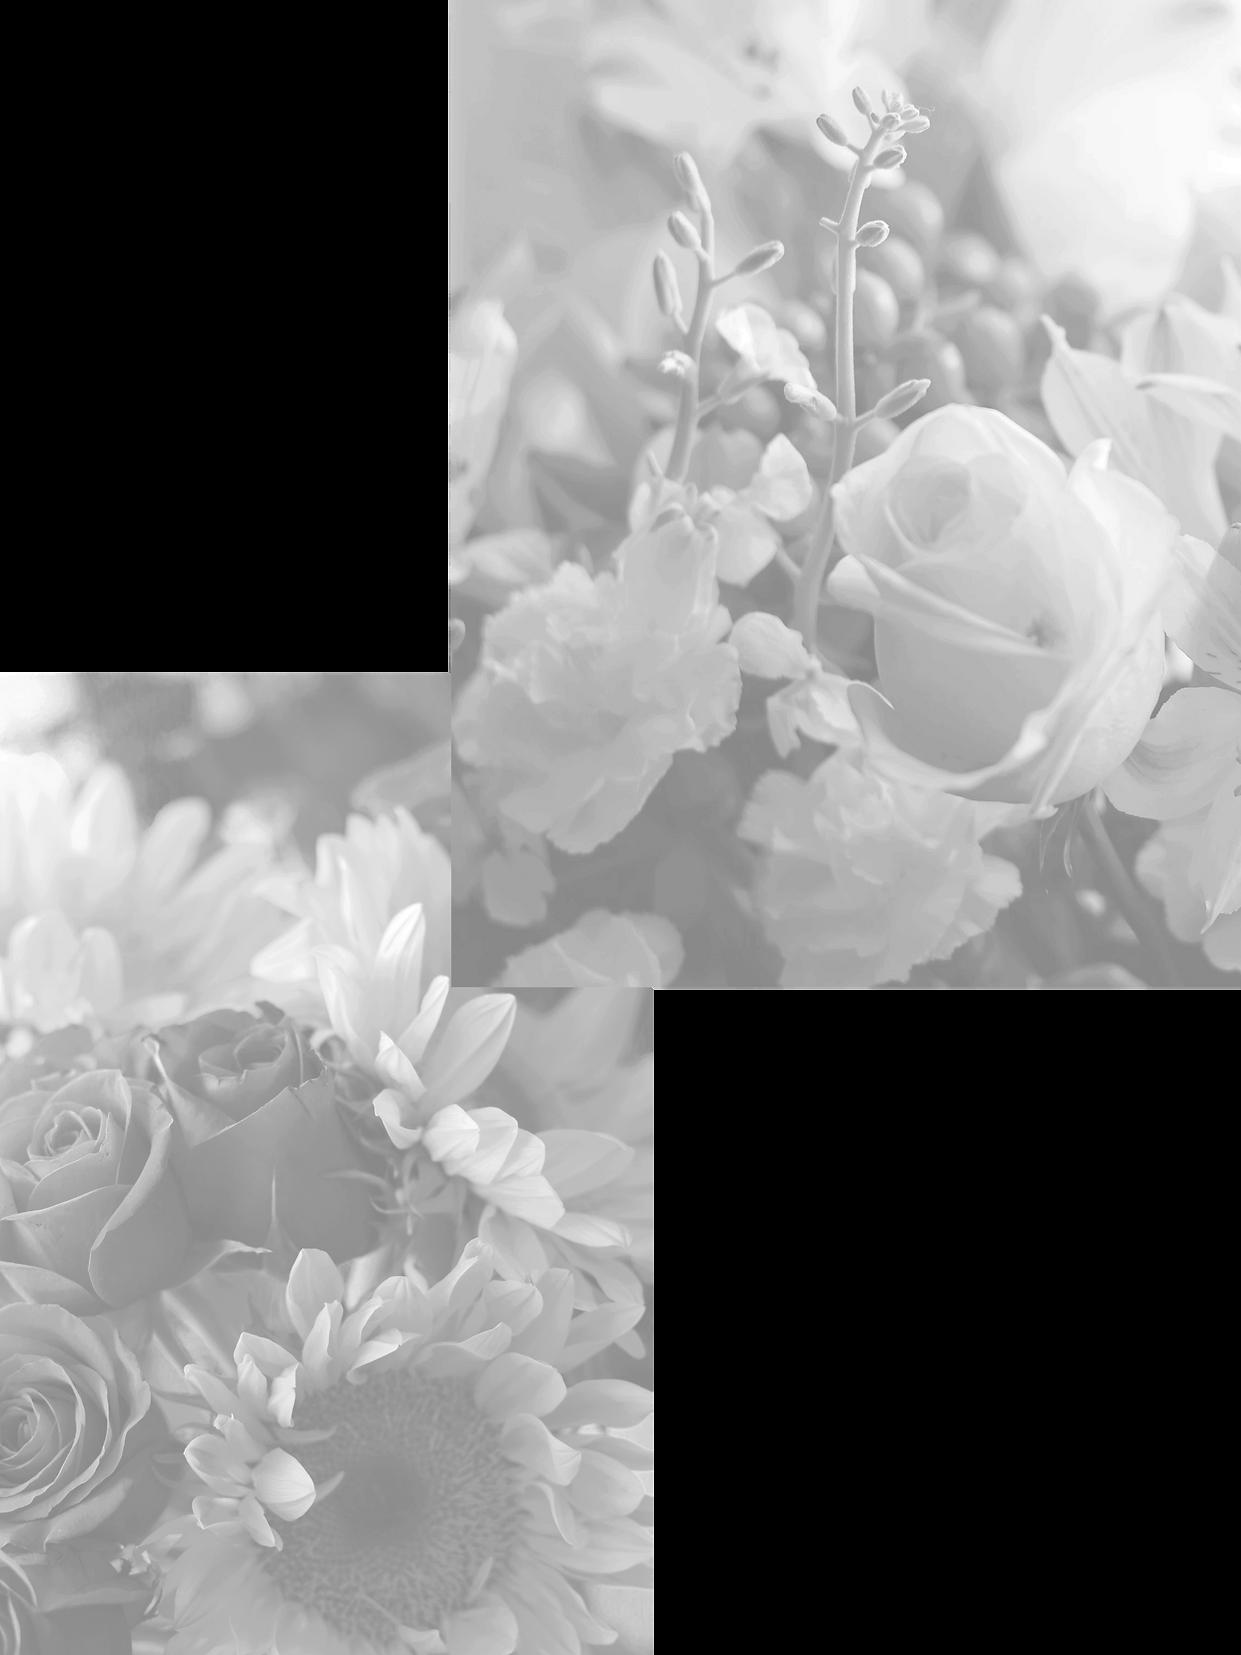 Untitled-2_edited_edited_edited_edited_e